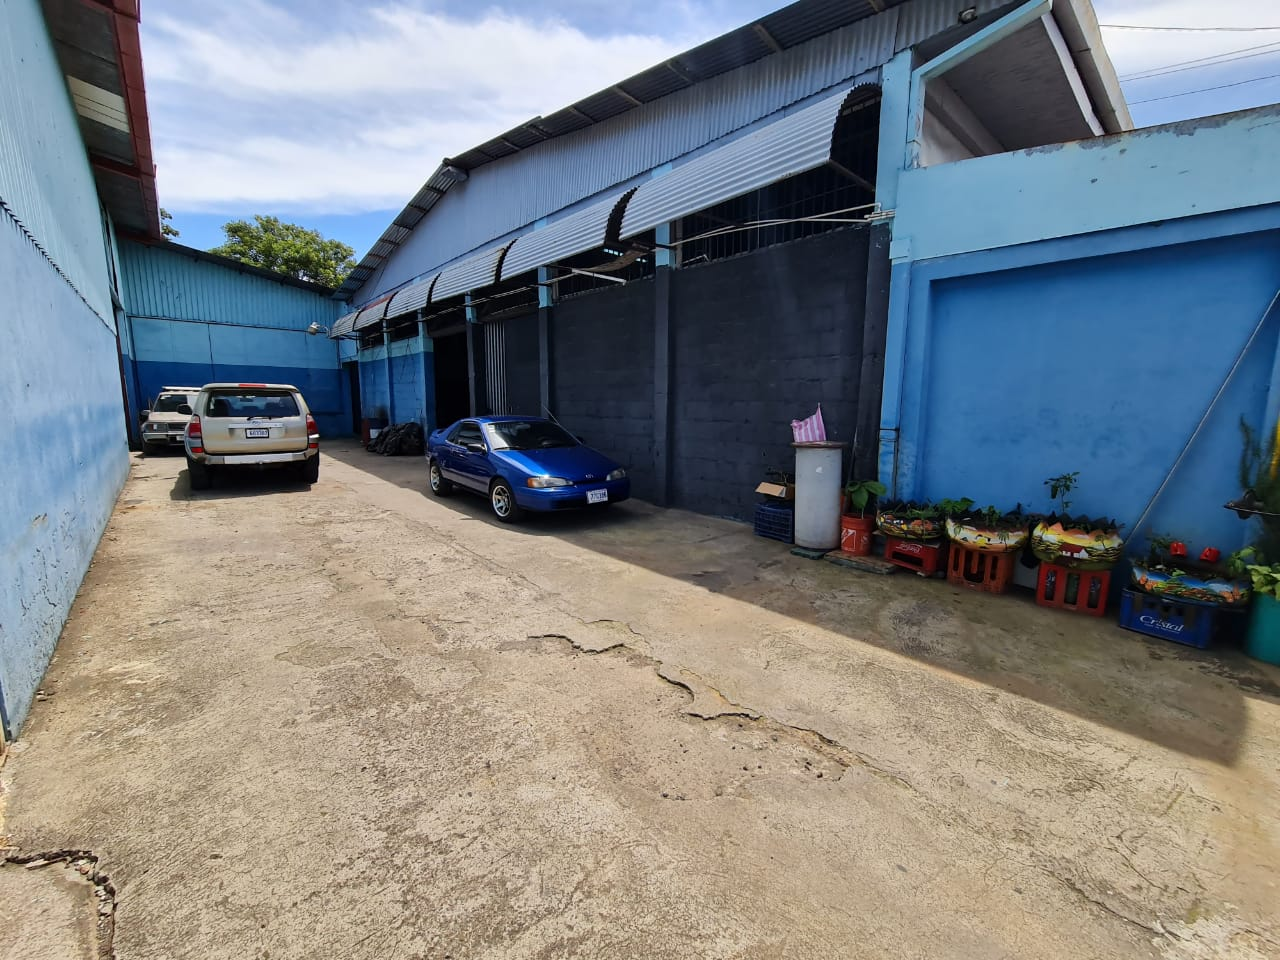 Alquiler de bodega en Villa Bonita de Alajuela, 130 m2, ¢250.000=